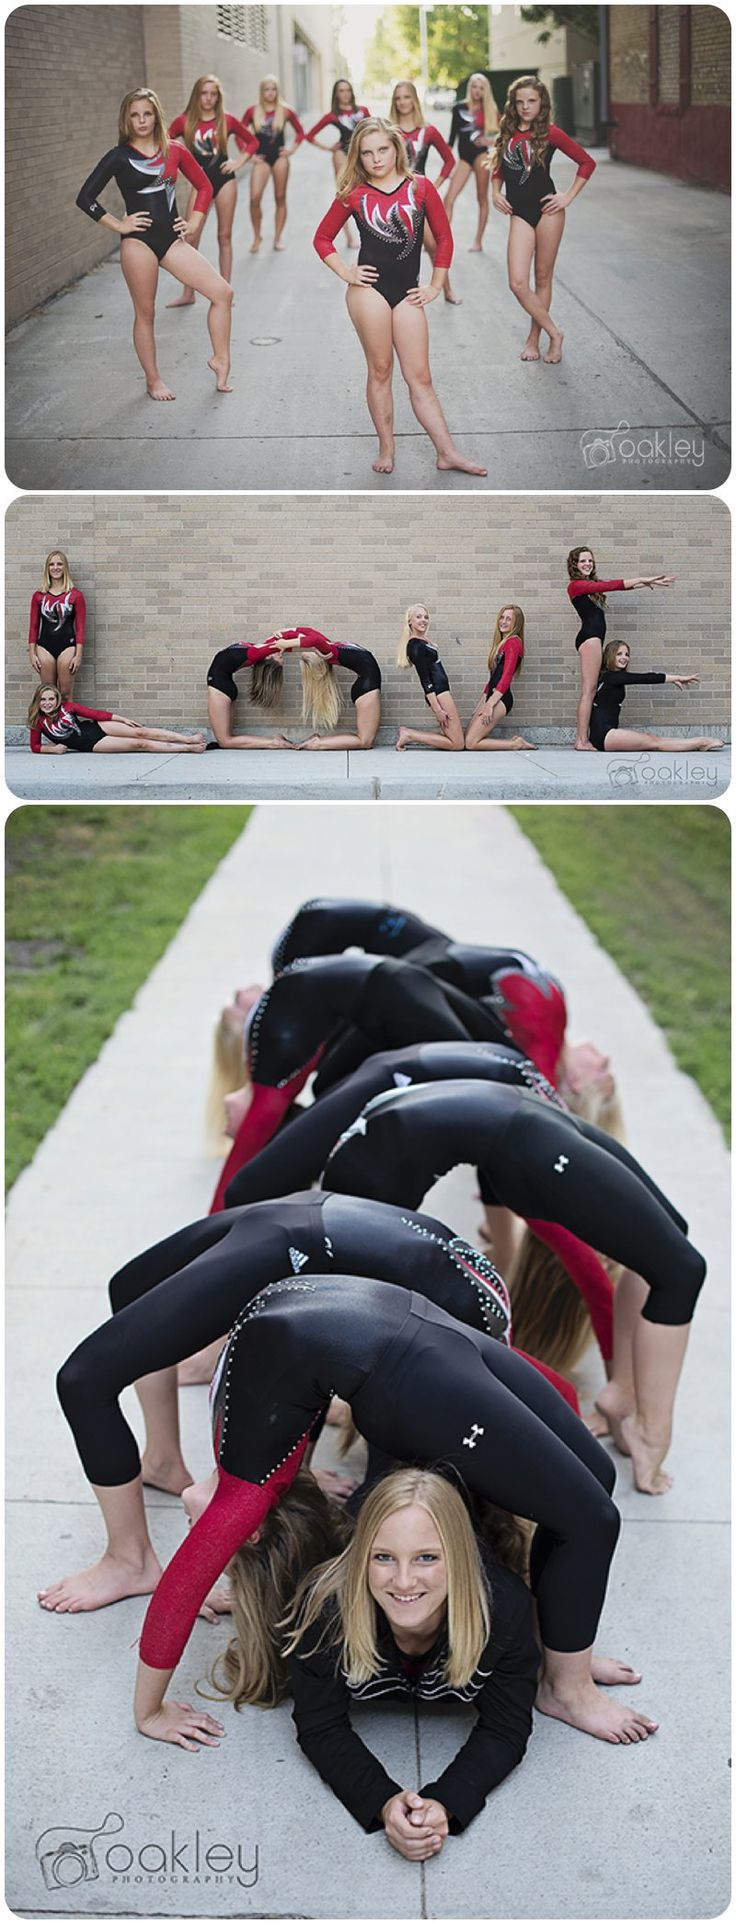 Team gymnastics photo ideas! Red River Valley Gymnastics Grand Forks, ND. :) kinda fun I happened across this photo.